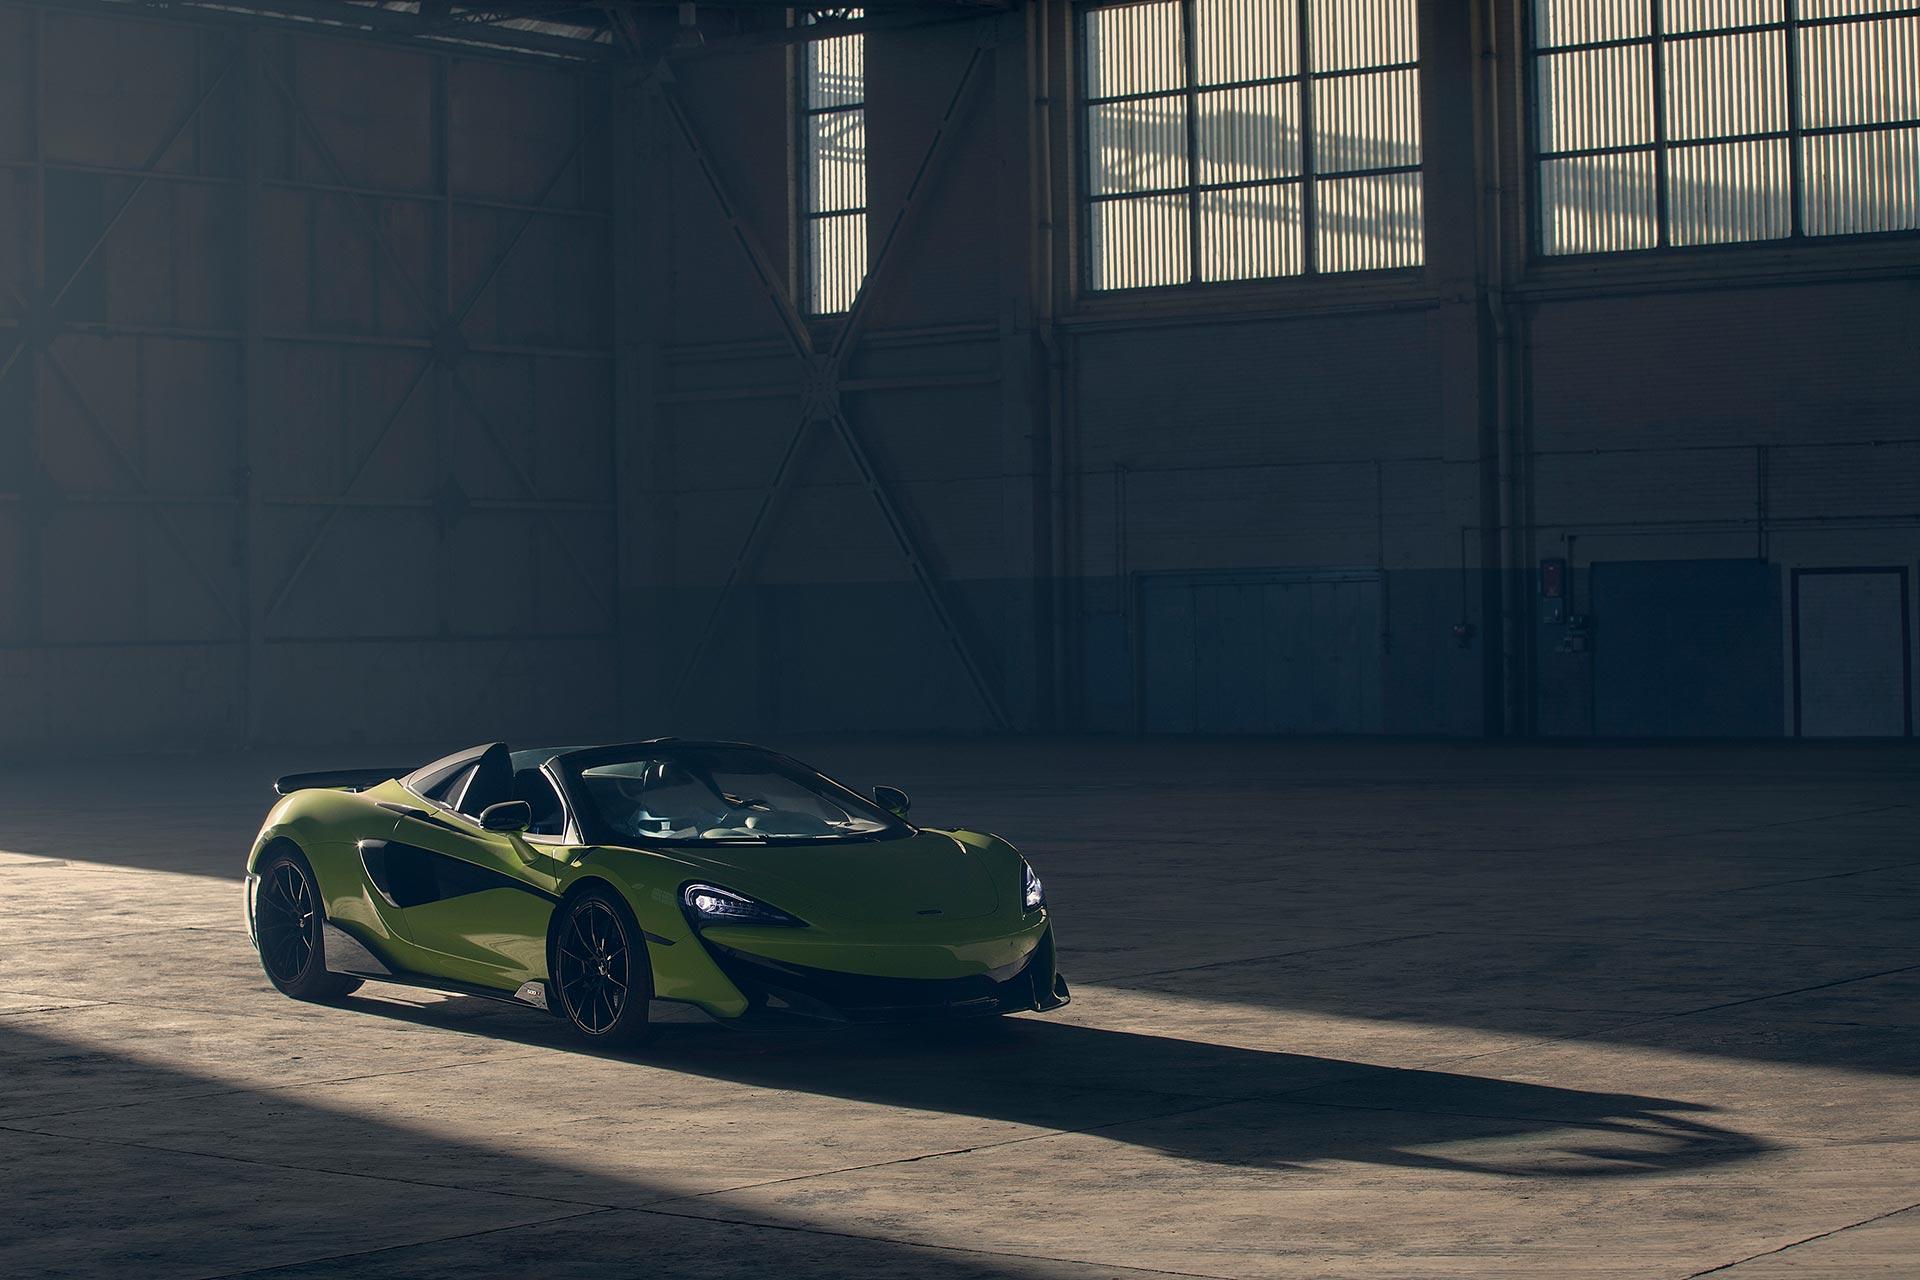 2019 McLaren 600 LT Spider